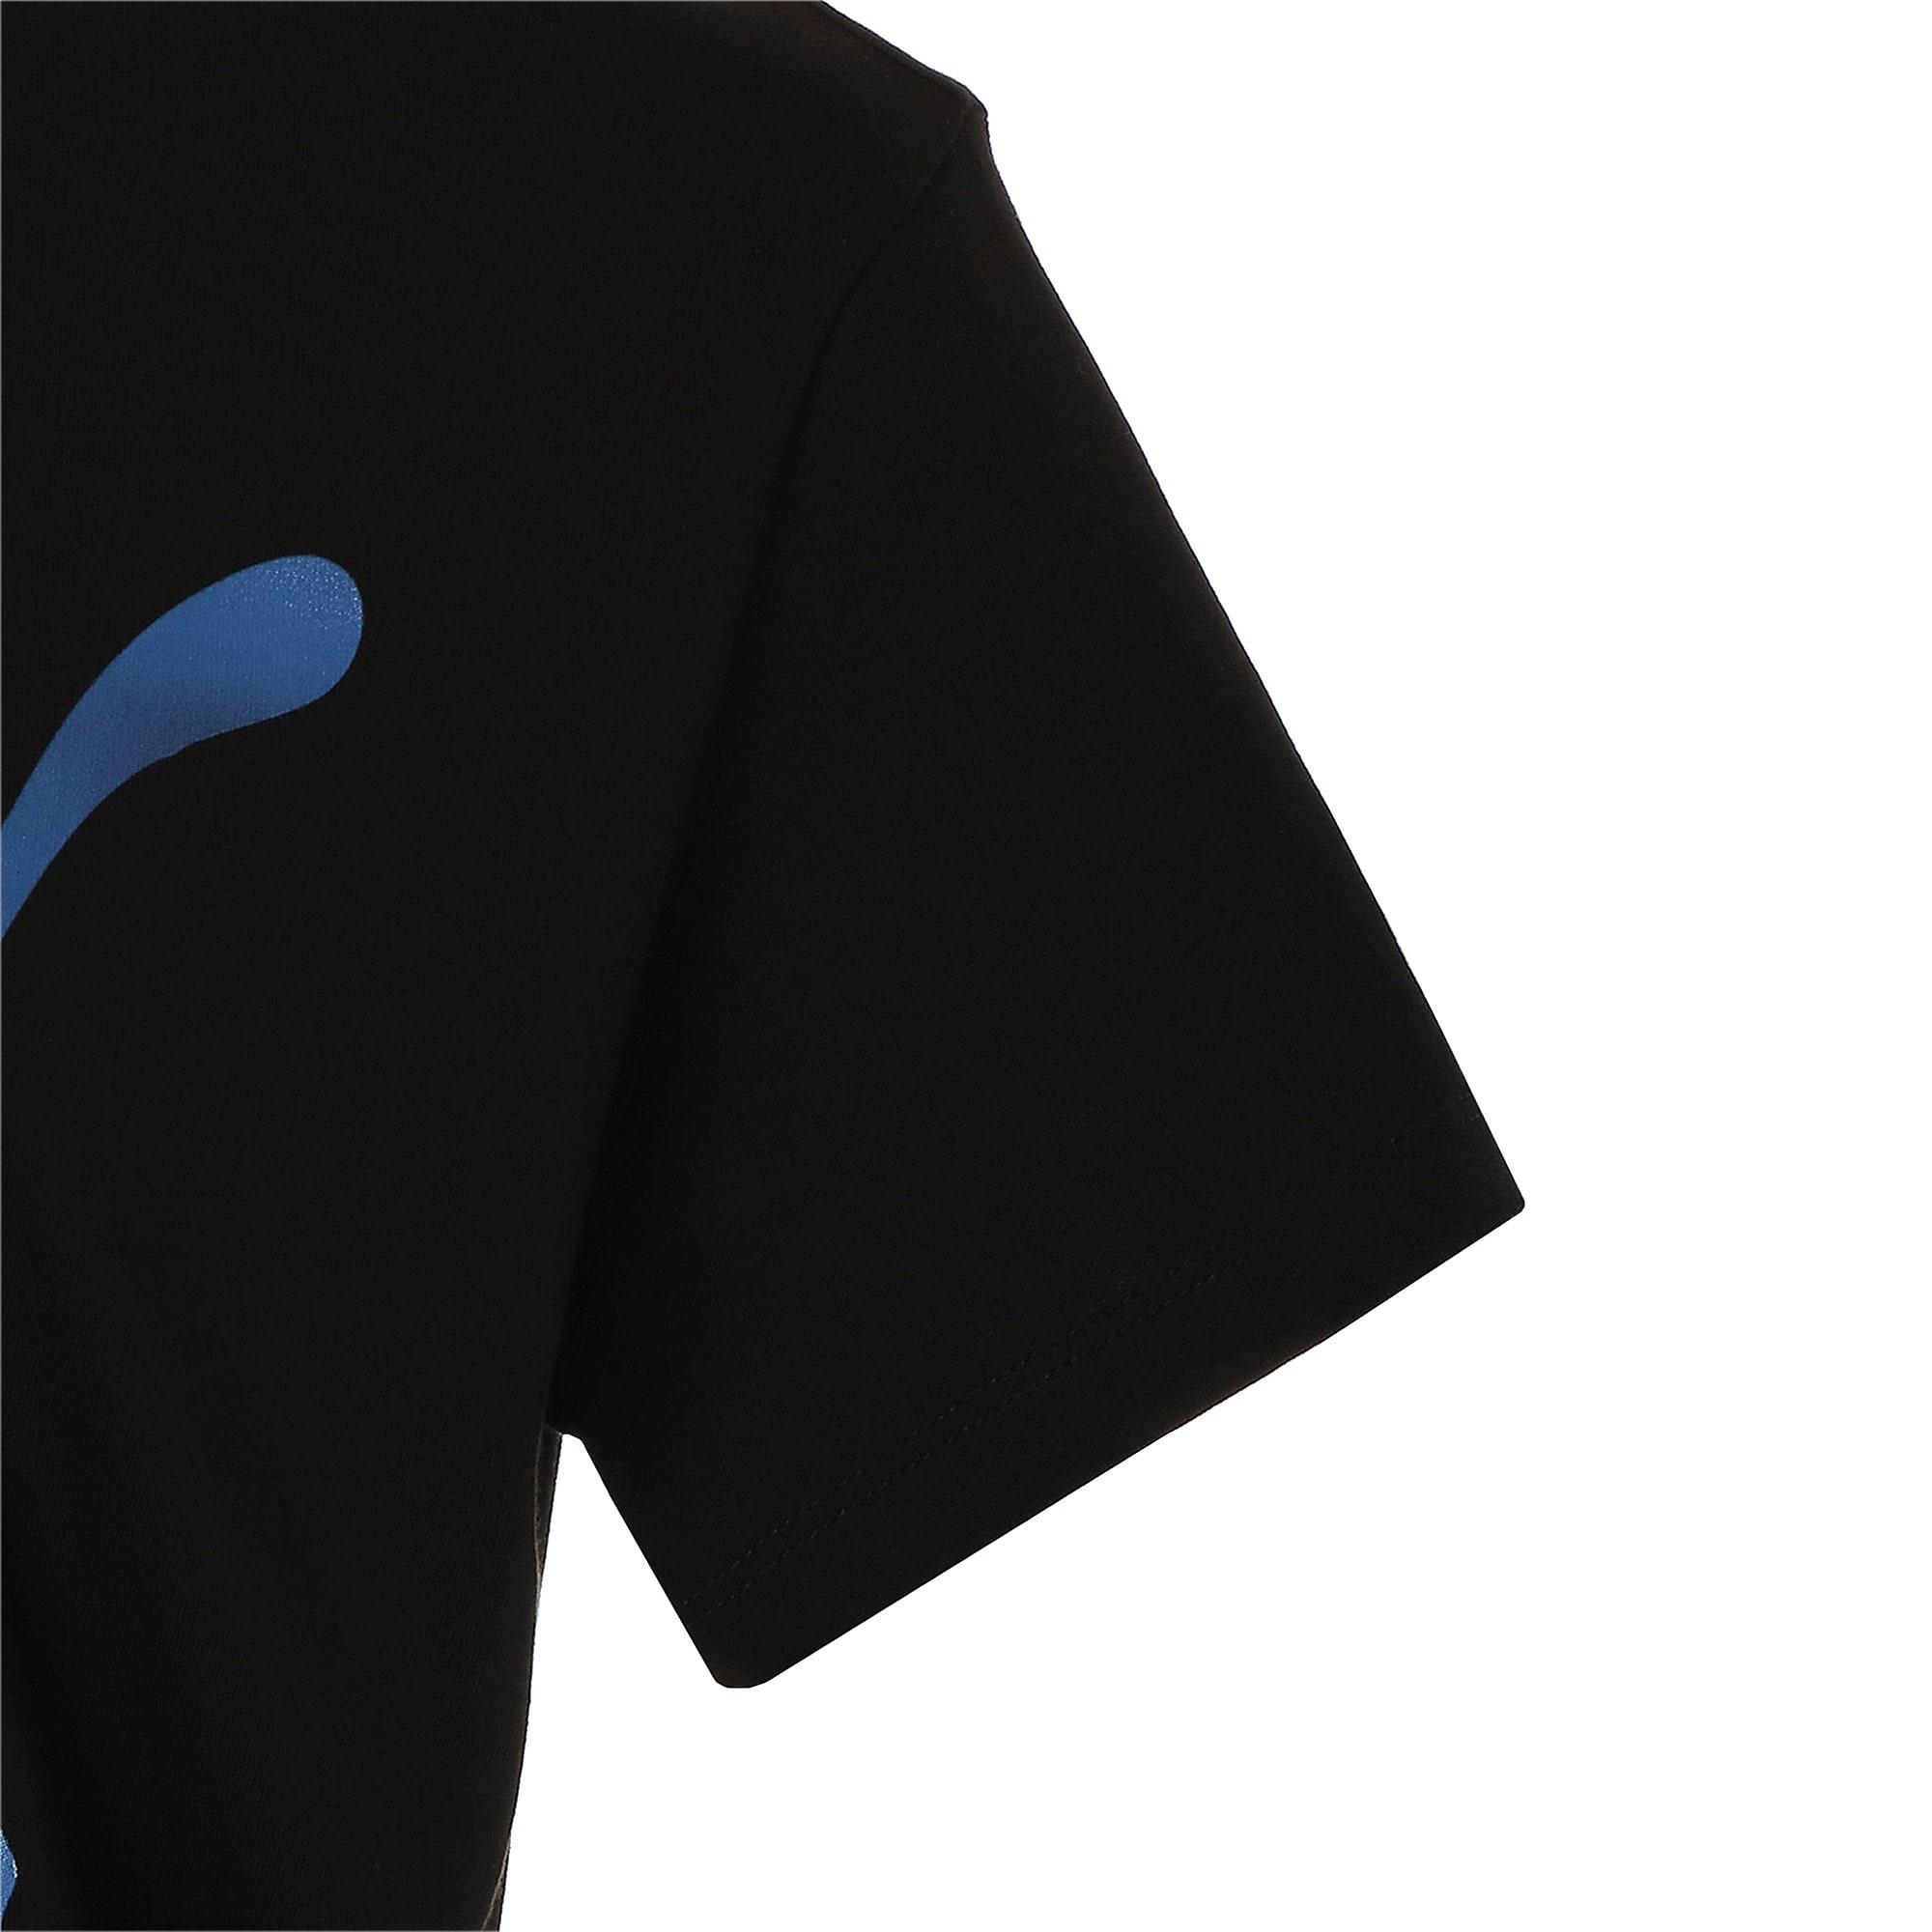 Thumbnail 5 of CLOUD パック ウィメンズ グラフィック Tシャツ, Puma Black, medium-JPN